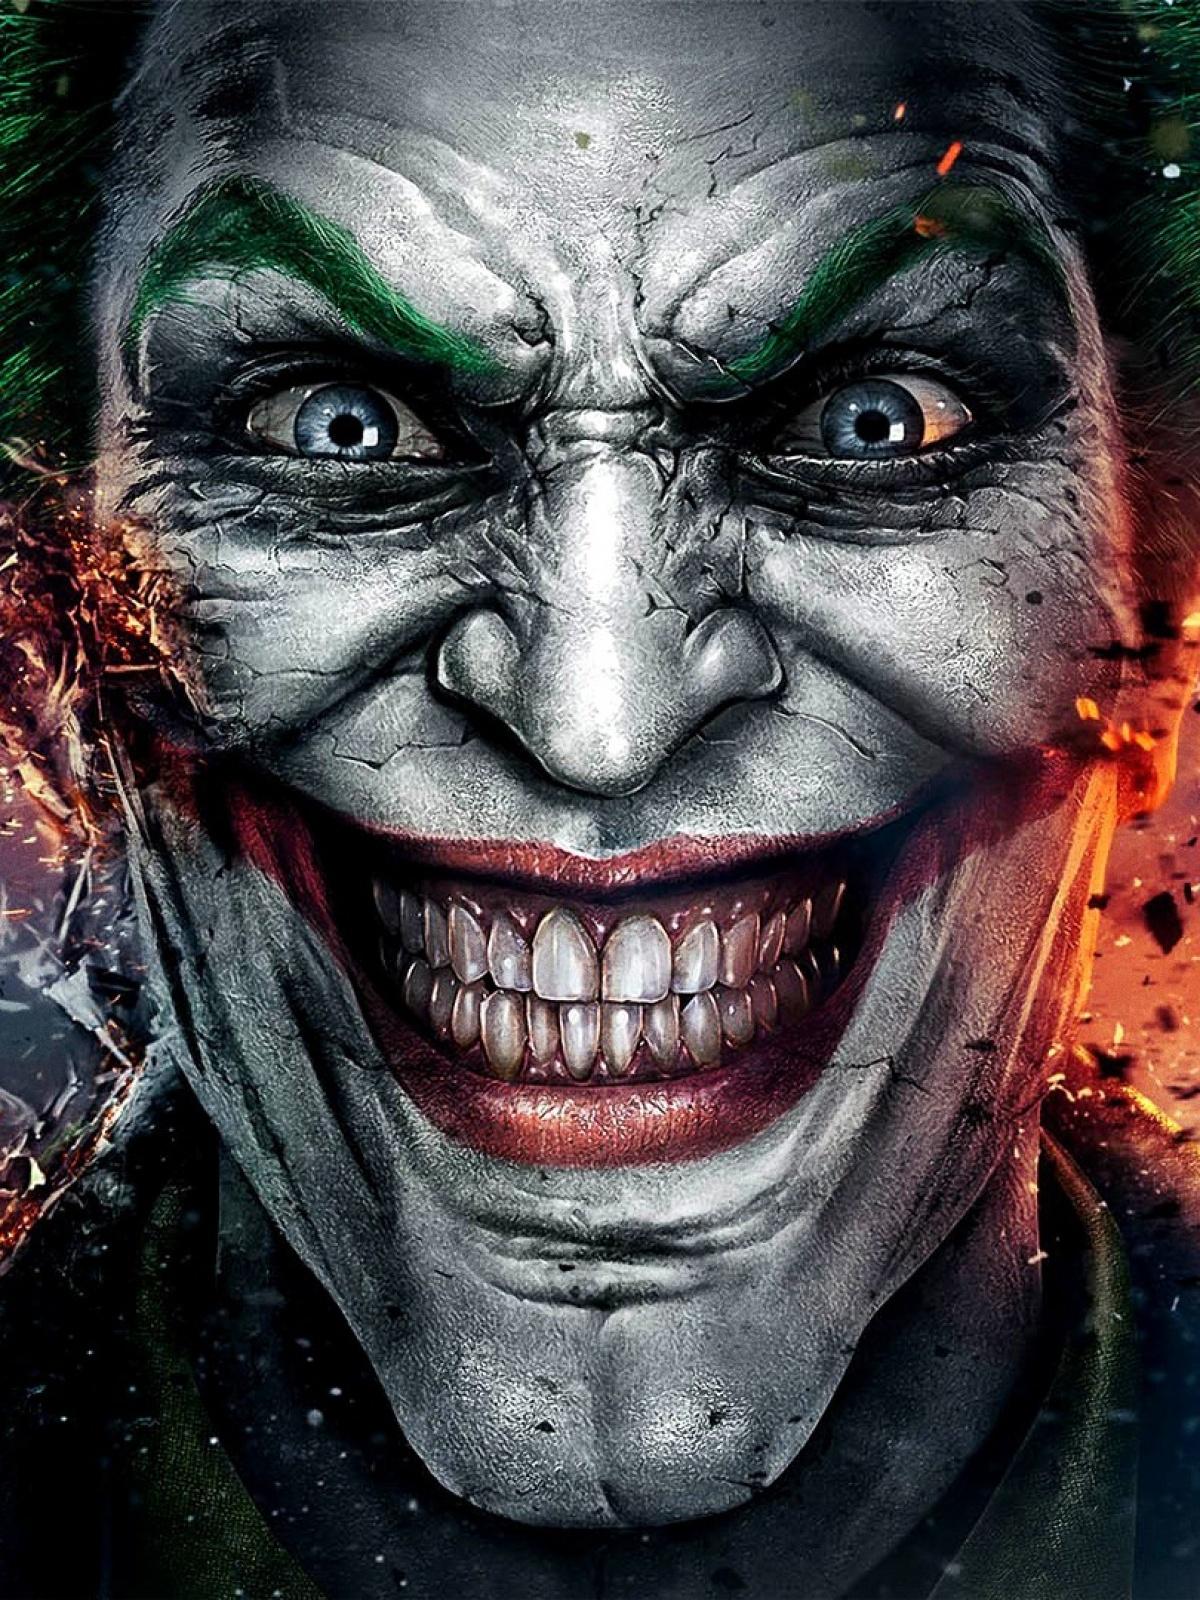 joker batman smile android wallpaper free download